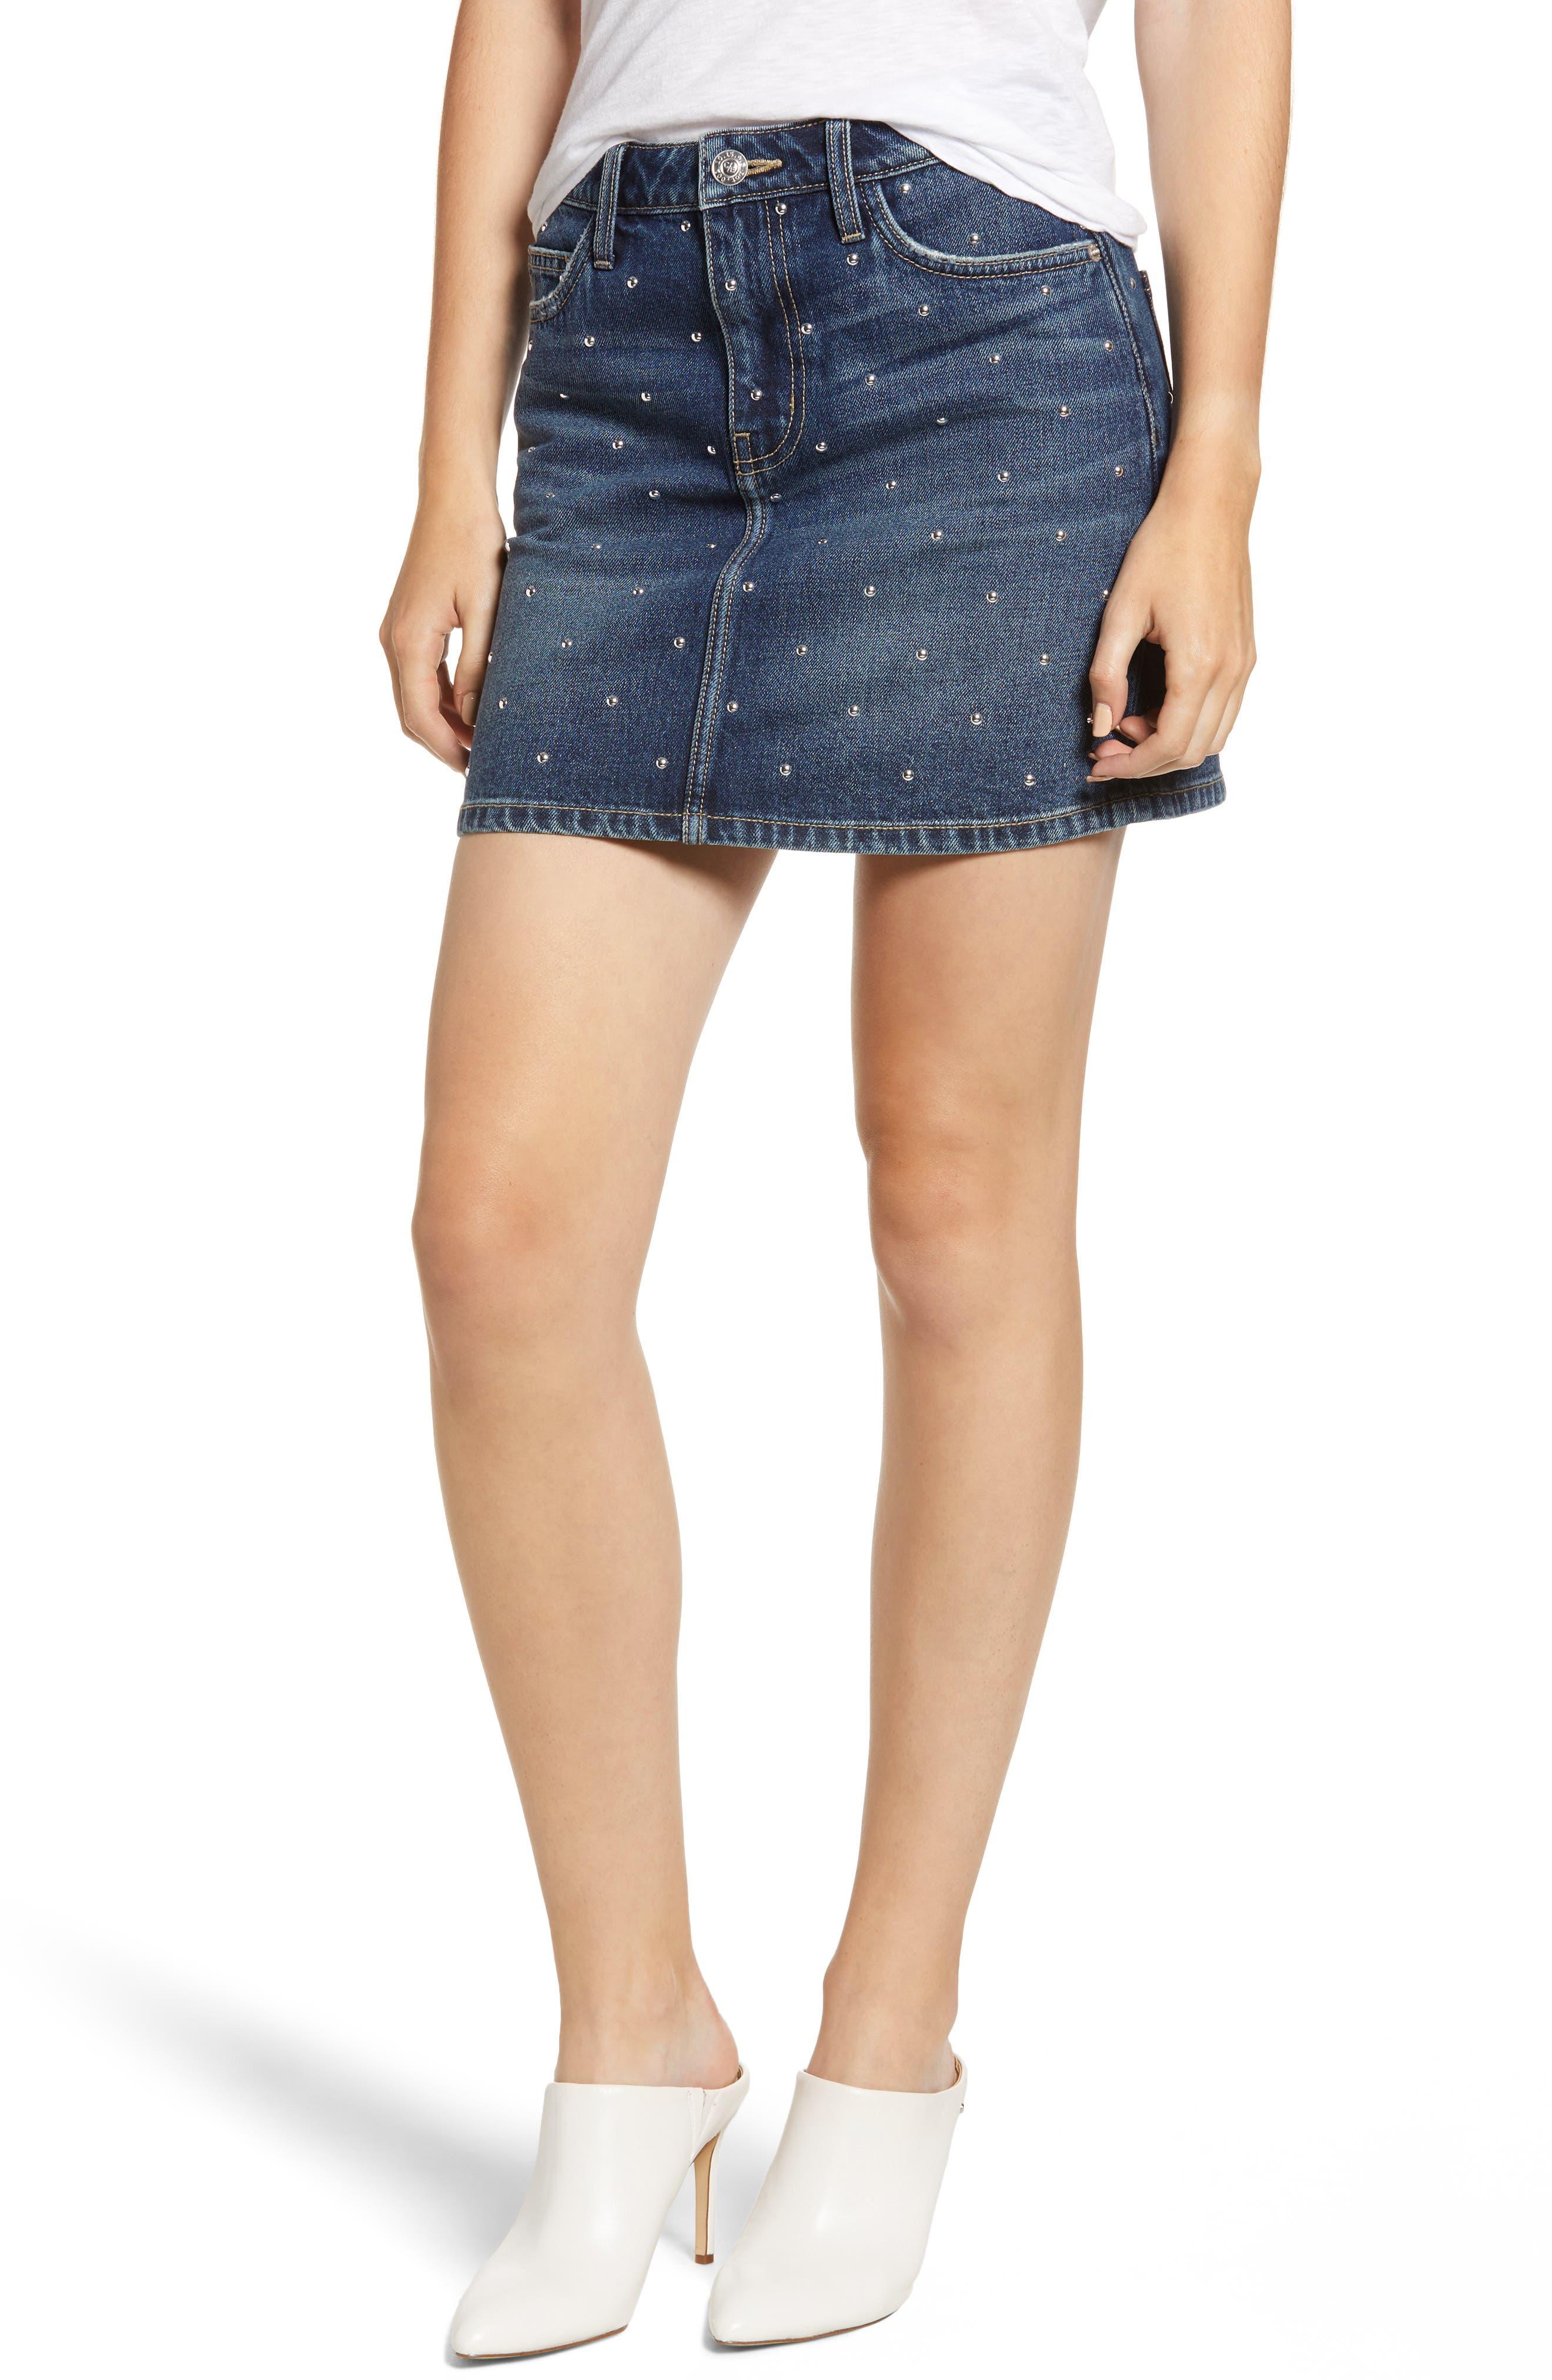 Current/Elliott Studded Denim Mini Skirt in Night Rider W/ Studded Dot